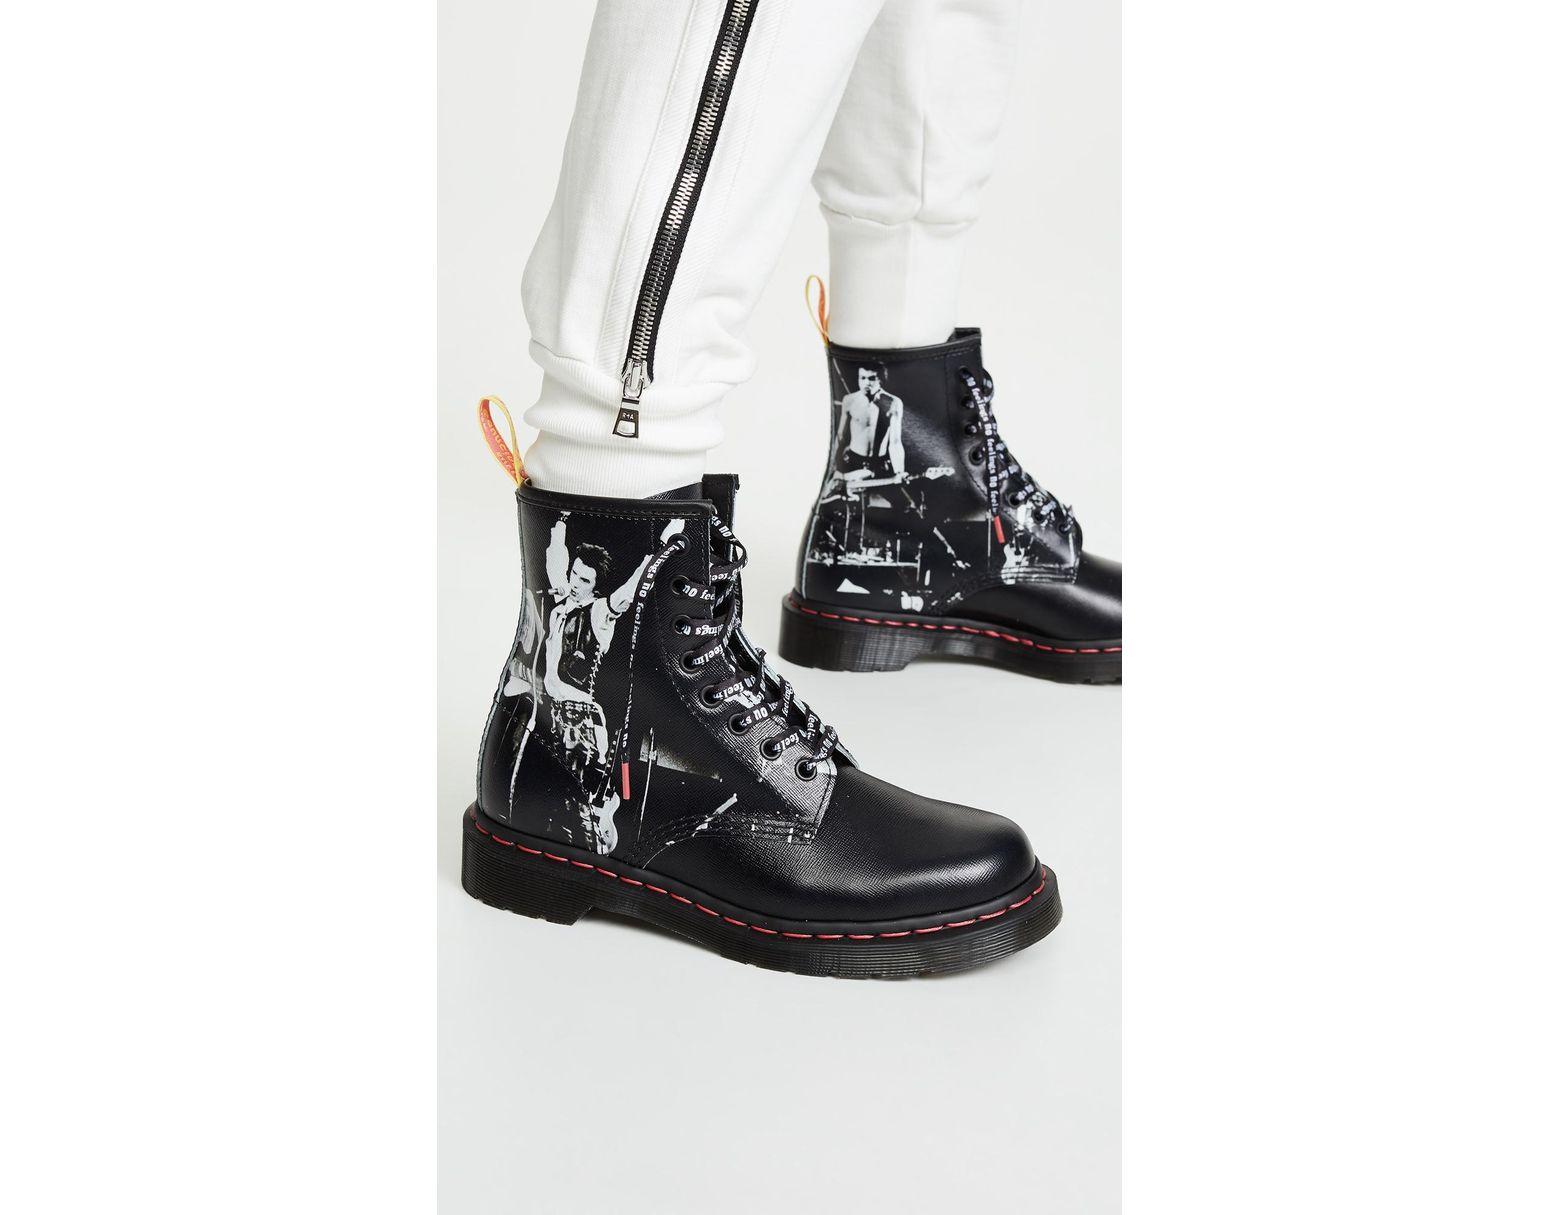 89813f2b Dr. Martens 1460 Sxp 8 Eye Boots in Black - Lyst